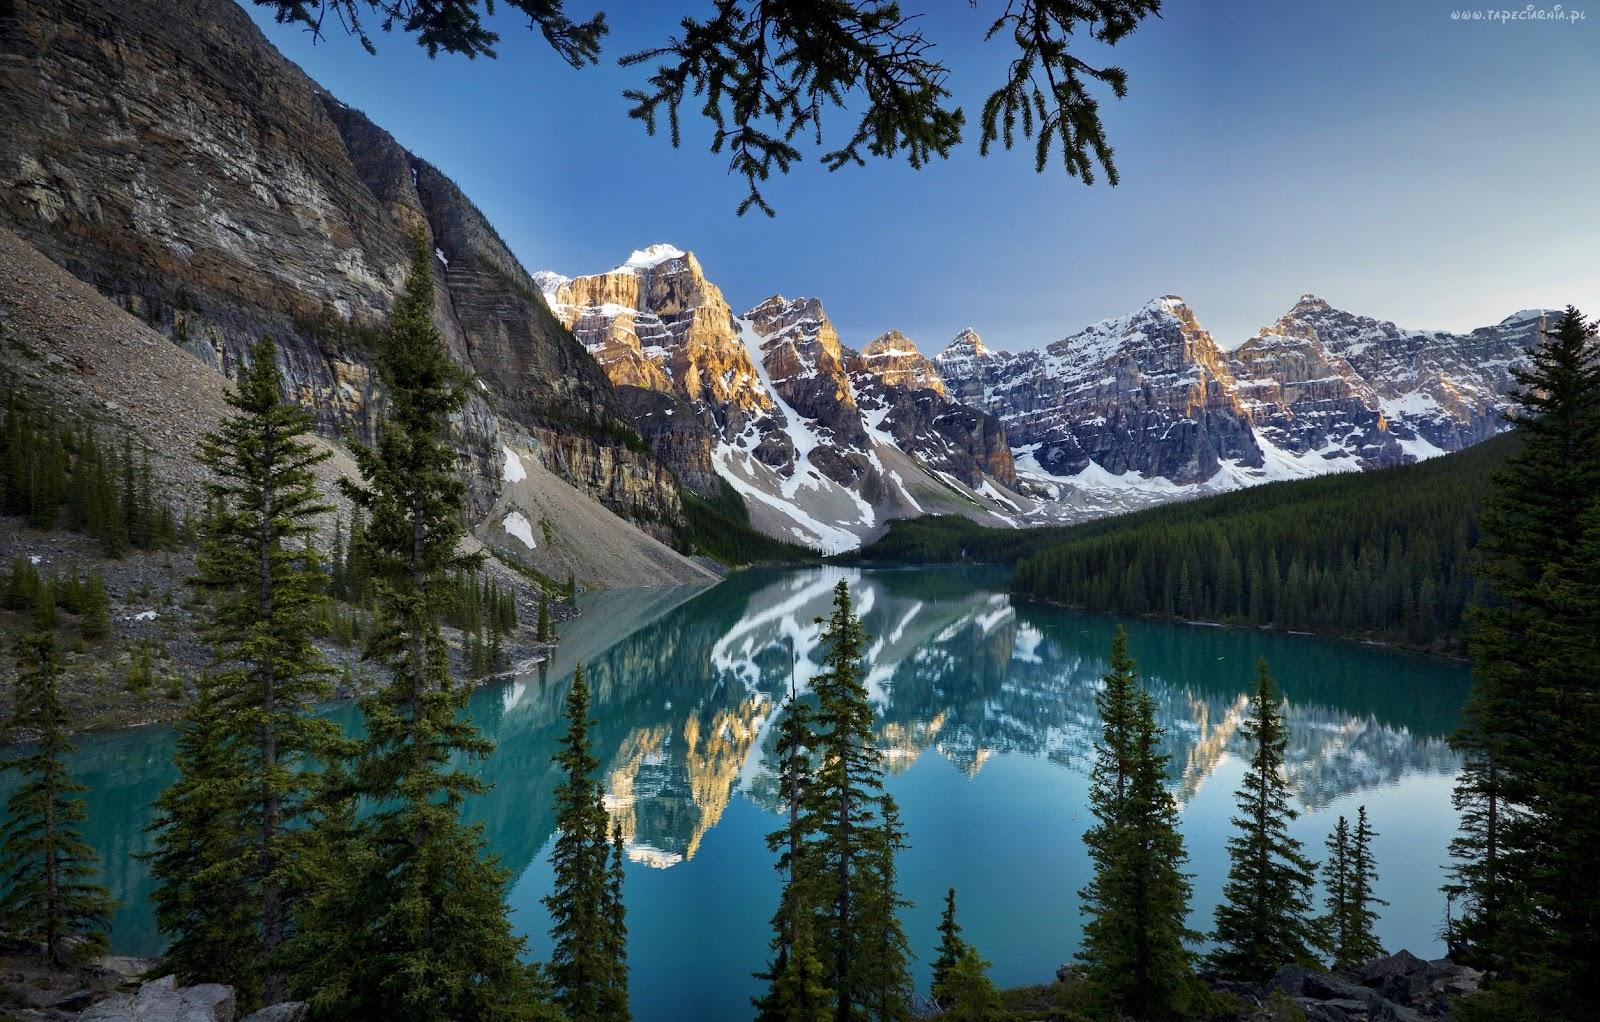 191395_jezioro_gory_las_park_narodowy_banf_kanada.jpg